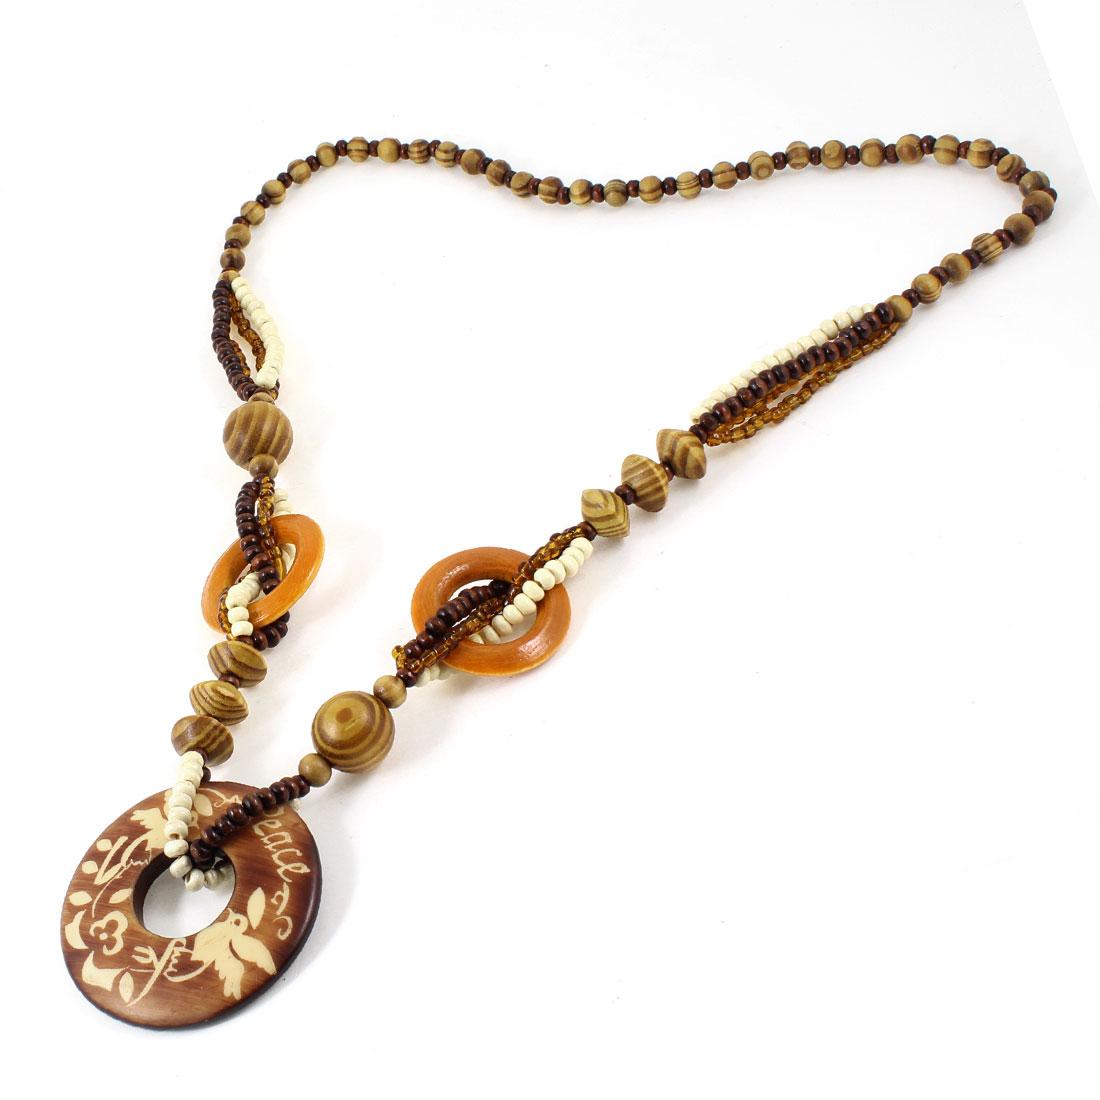 "Women Round Wooden Sweater Necklace Chain Brown 34"" L"